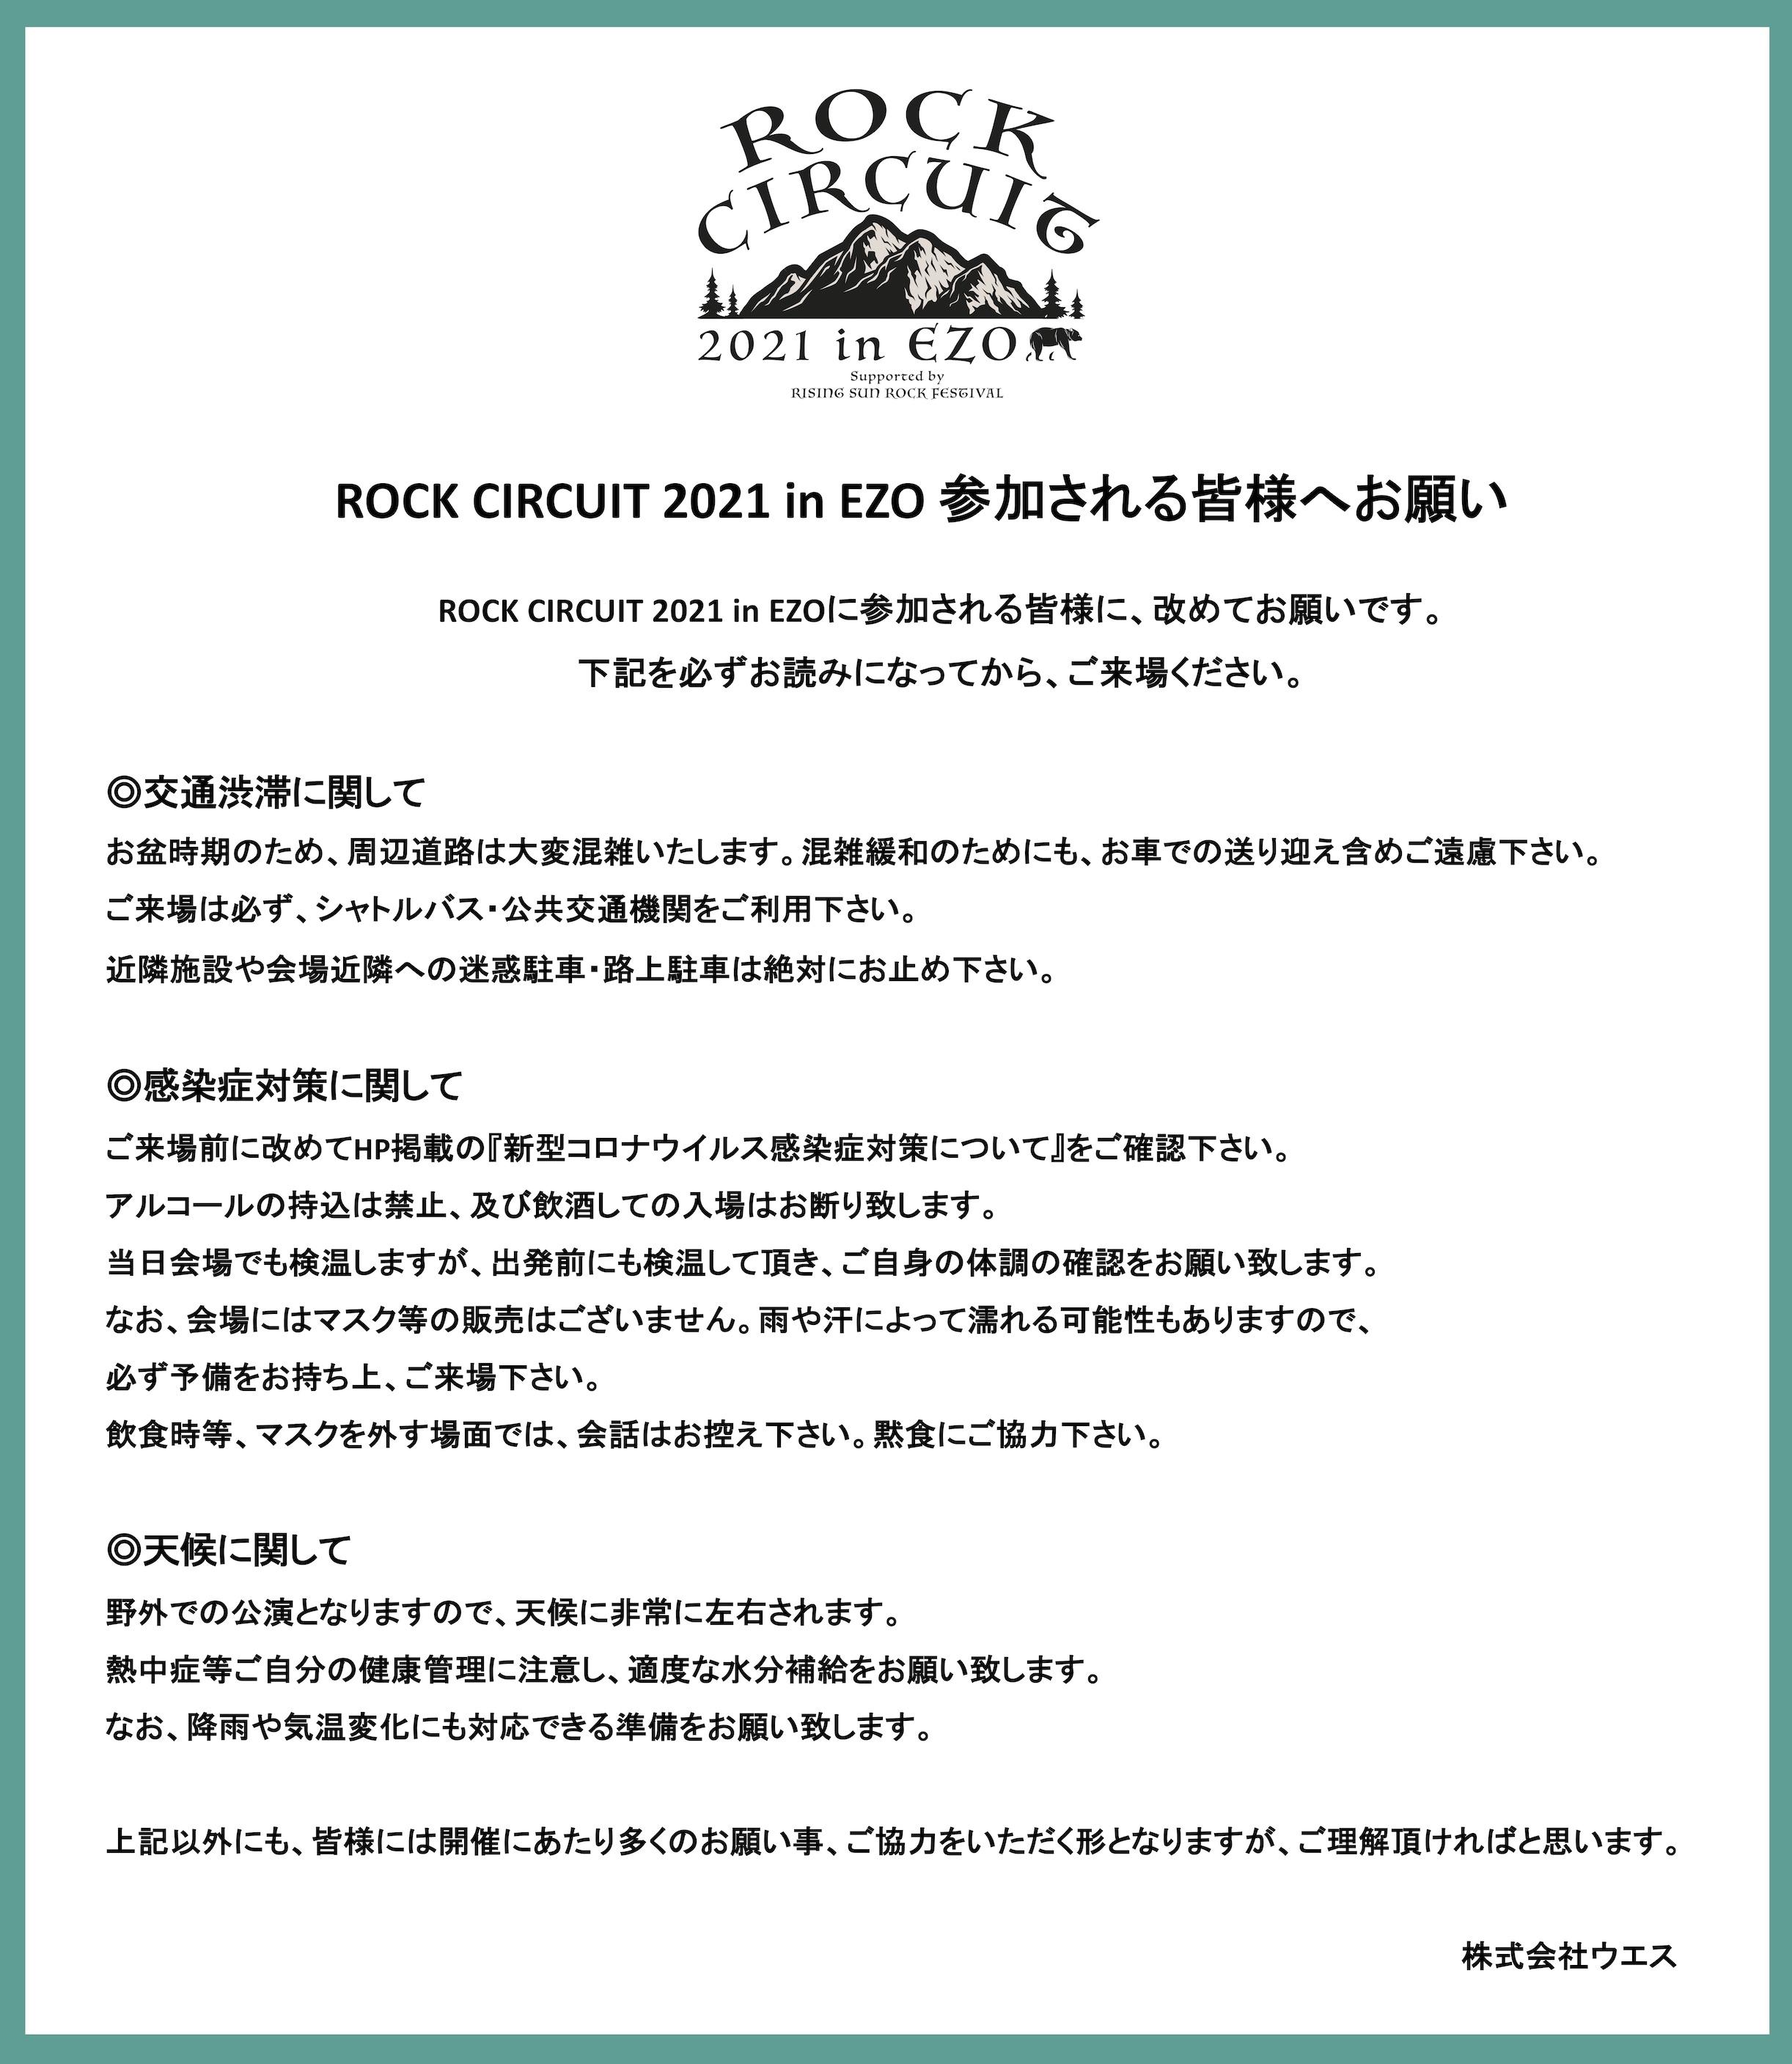 rc2021_info